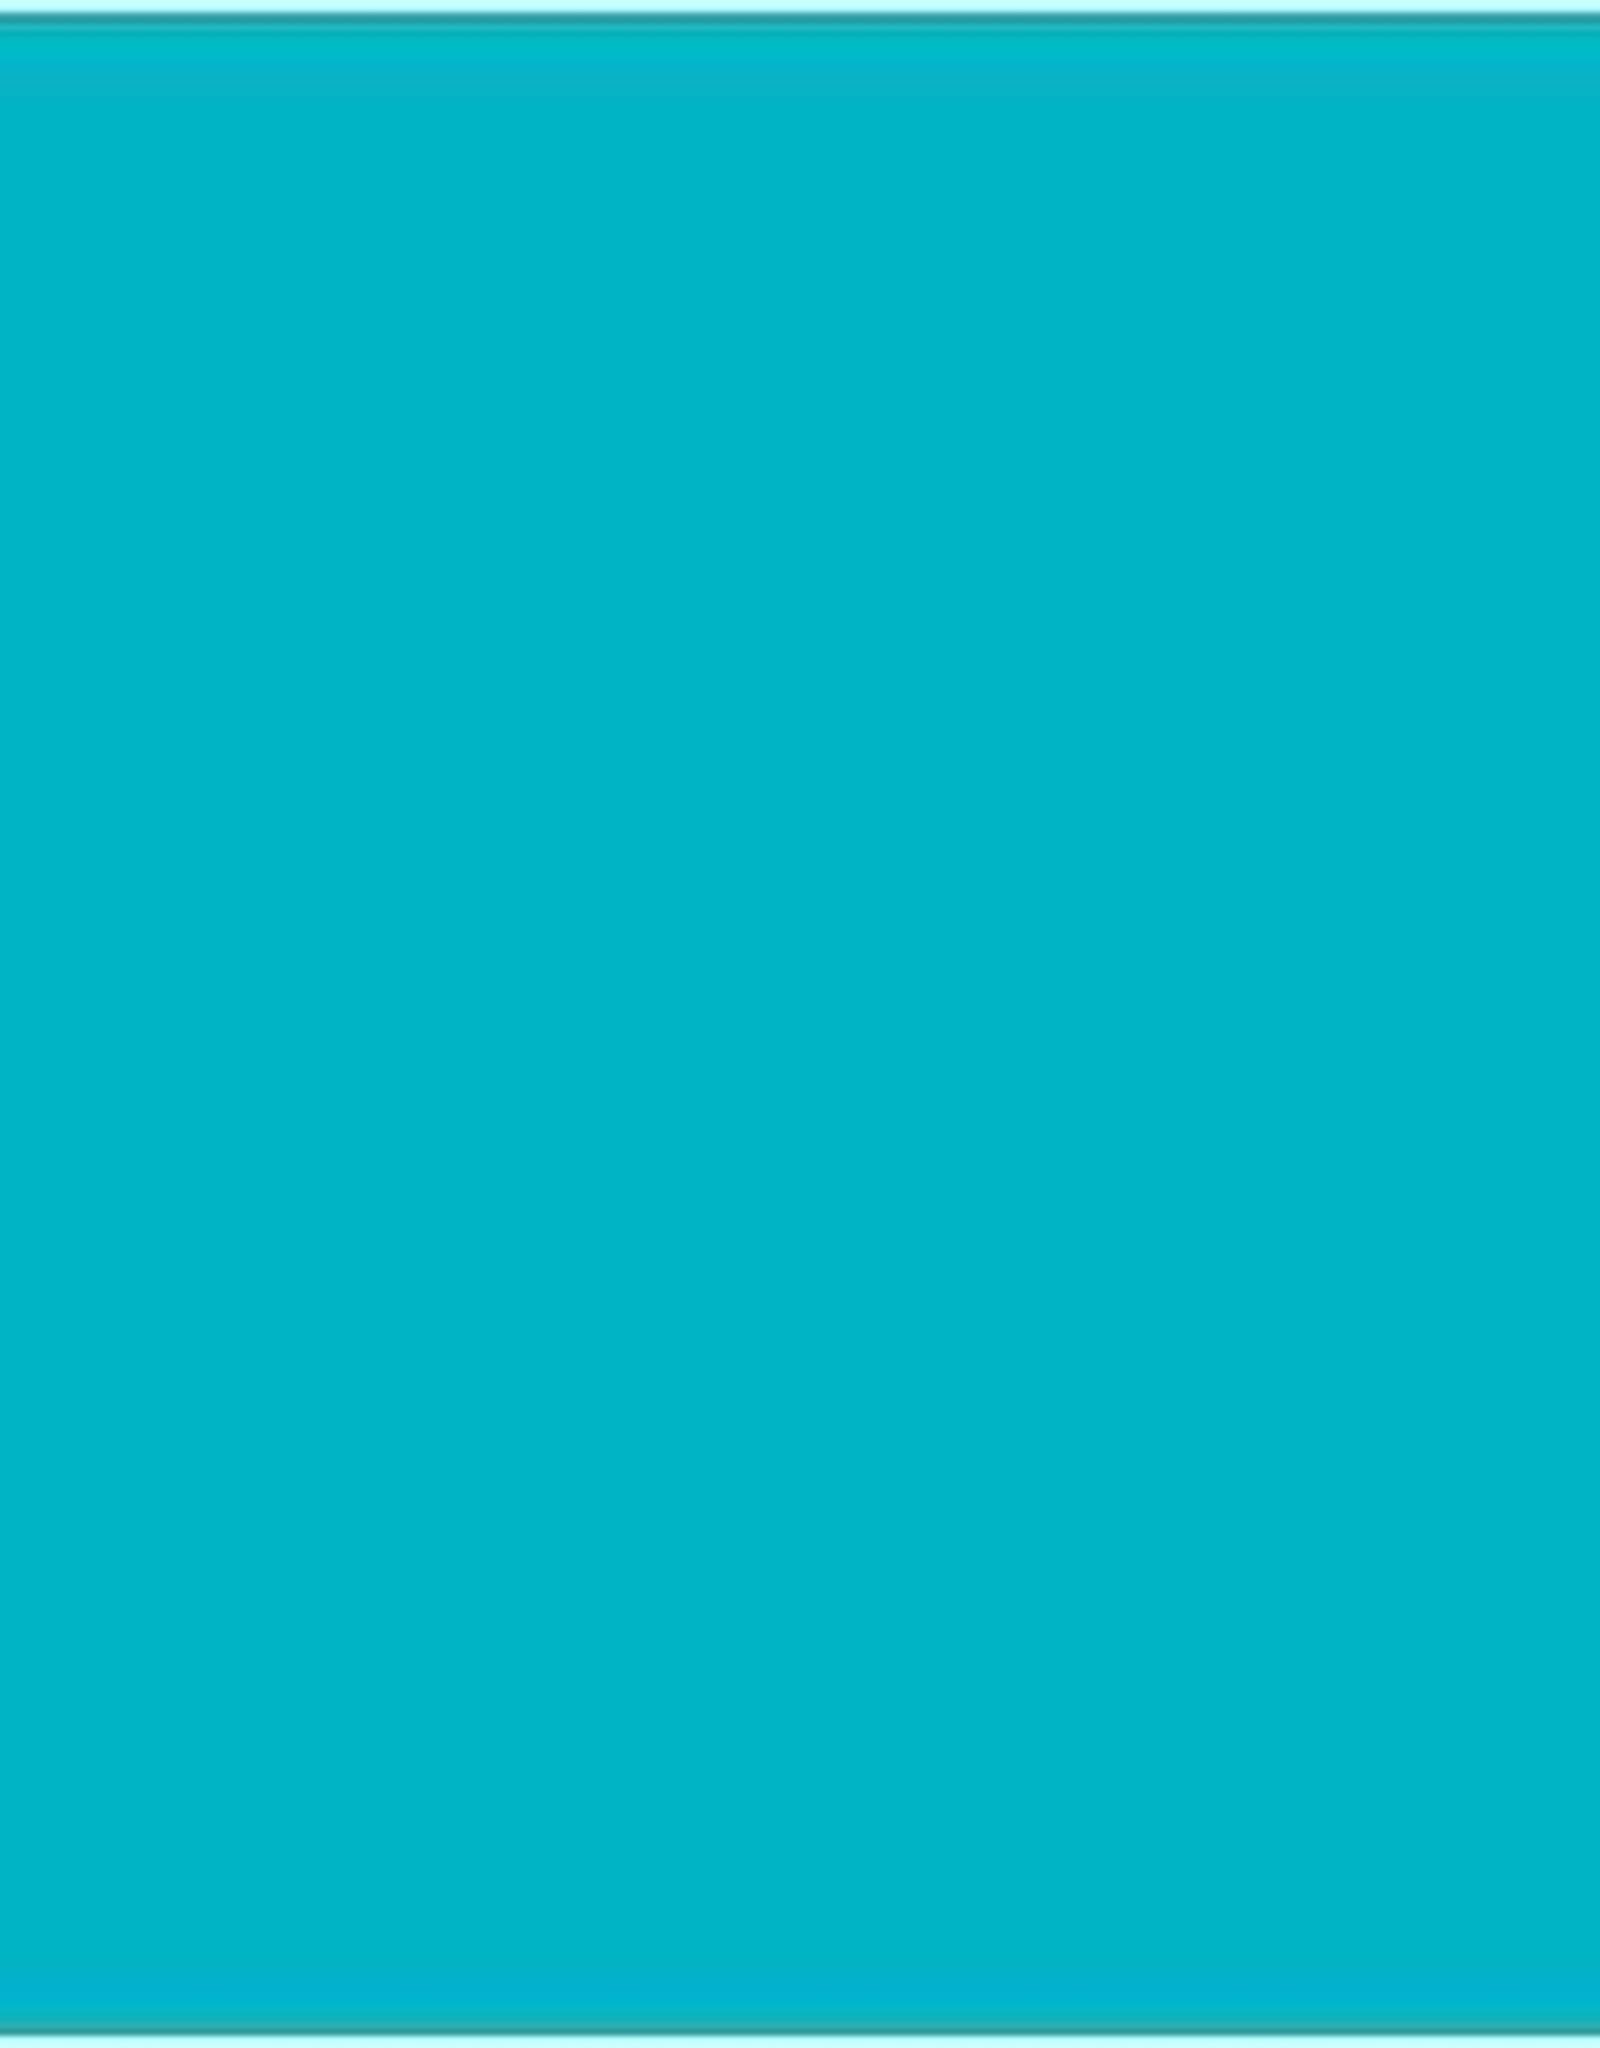 Ribboordstof - Turquoise